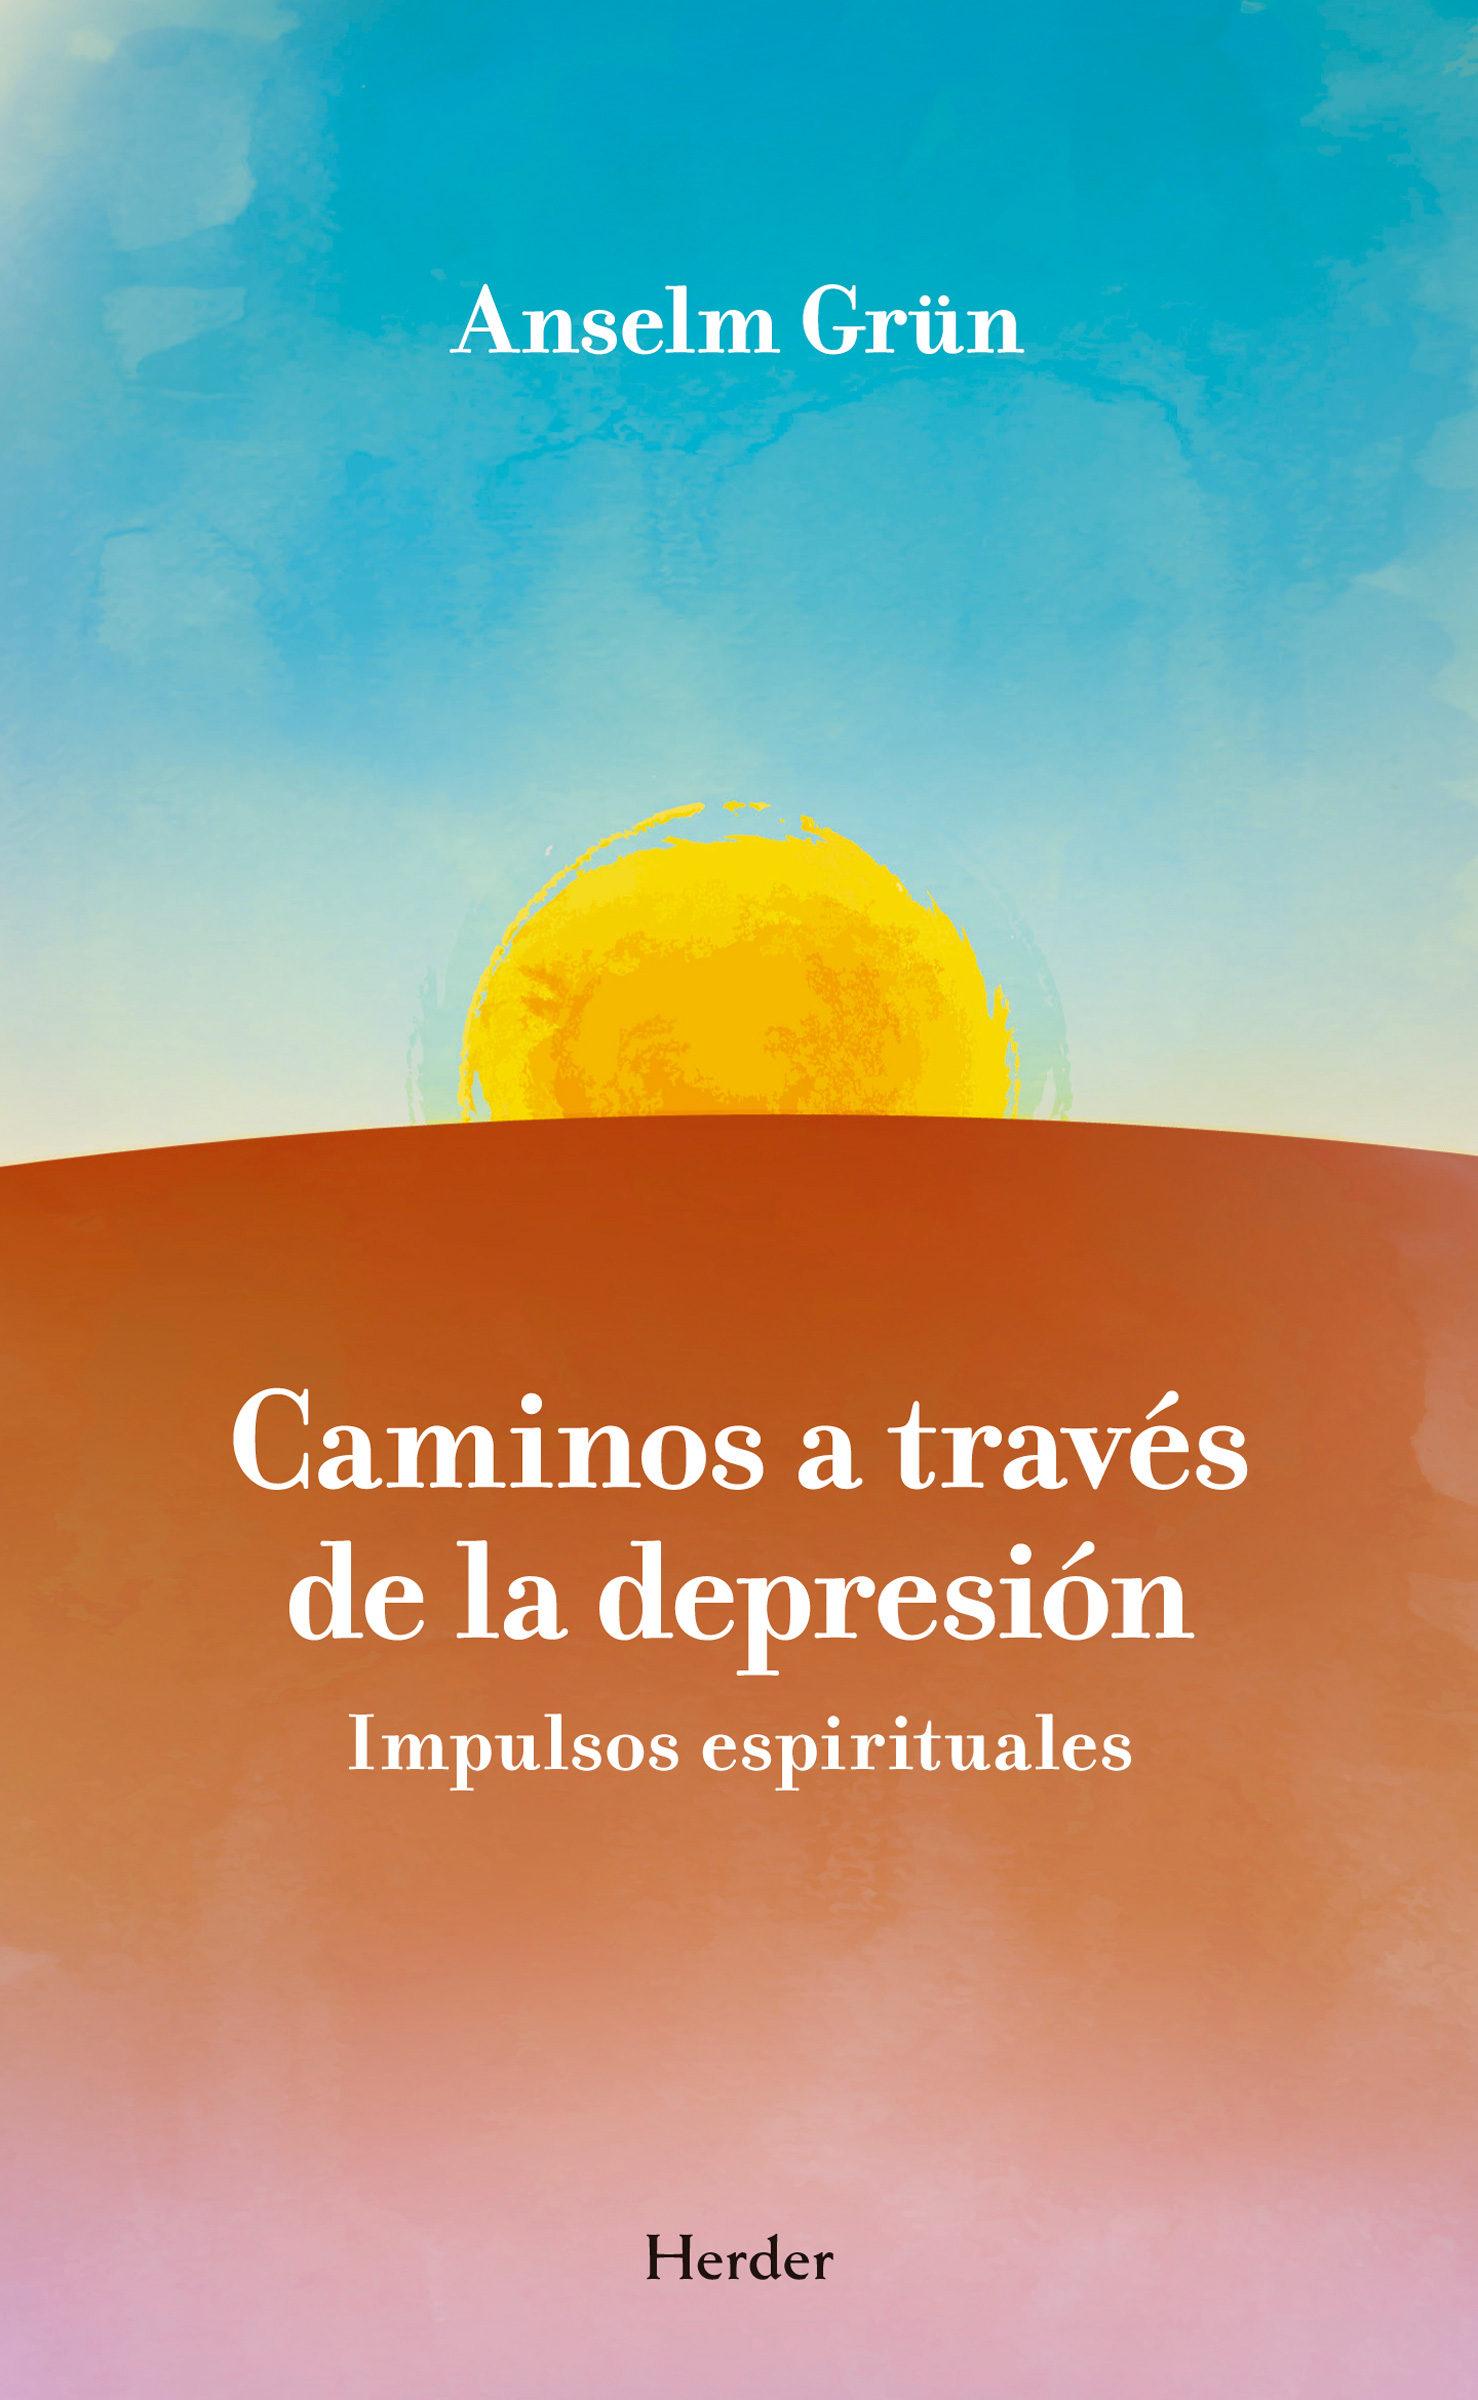 Caminos A Traves De La Depresion: Impulsos Espirituales por Anselm Grün